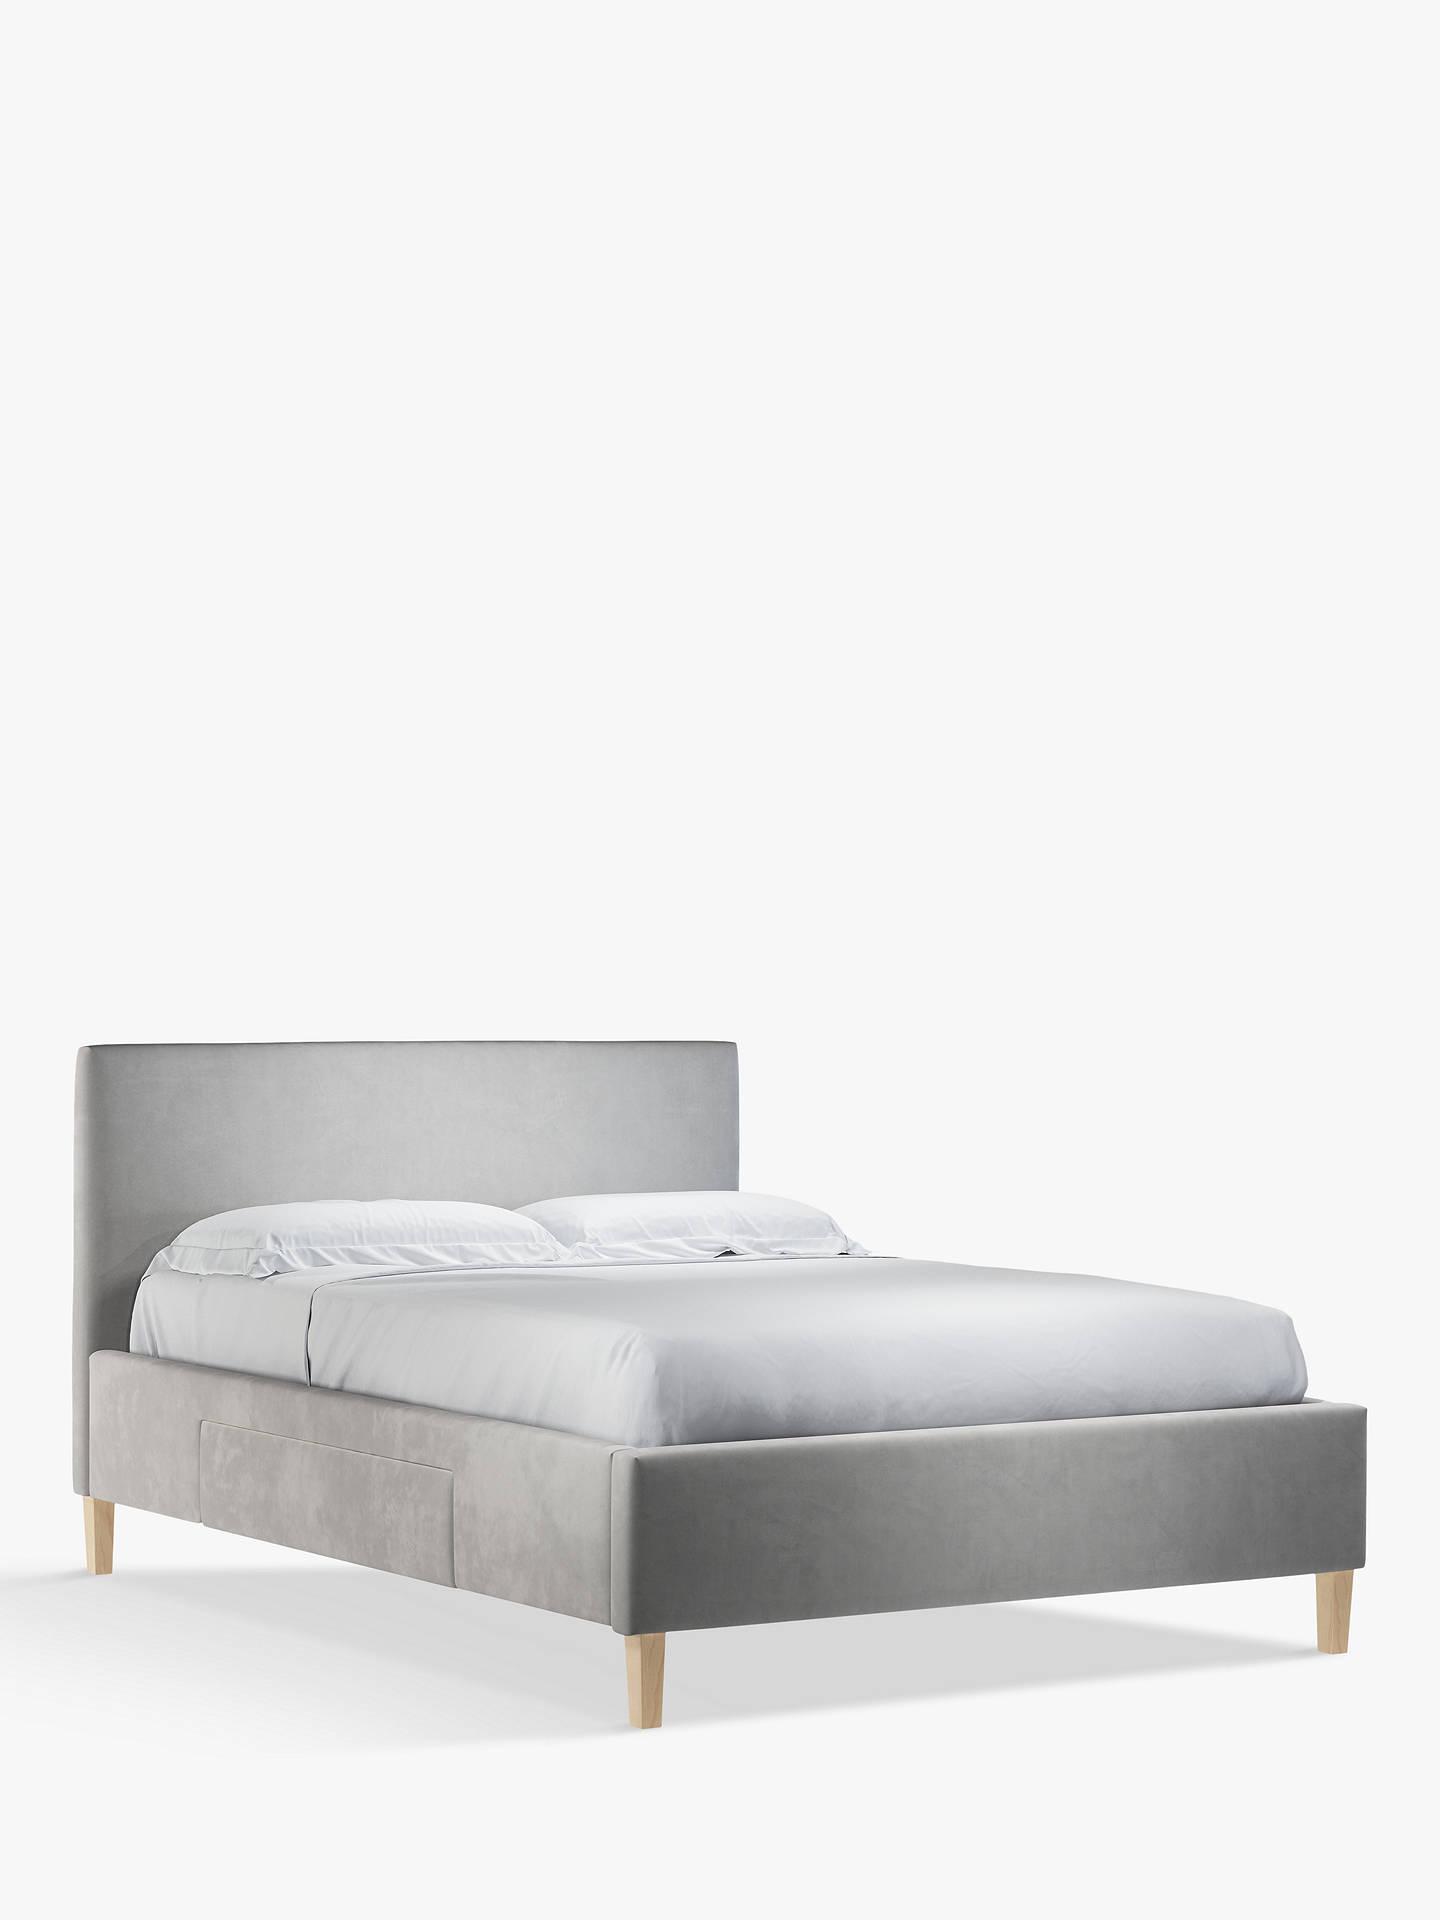 f4b98c23a725 ... Buy John Lewis & Partners Emily 2 Drawer Storage Upholstered Bed Frame,  King Size, ...